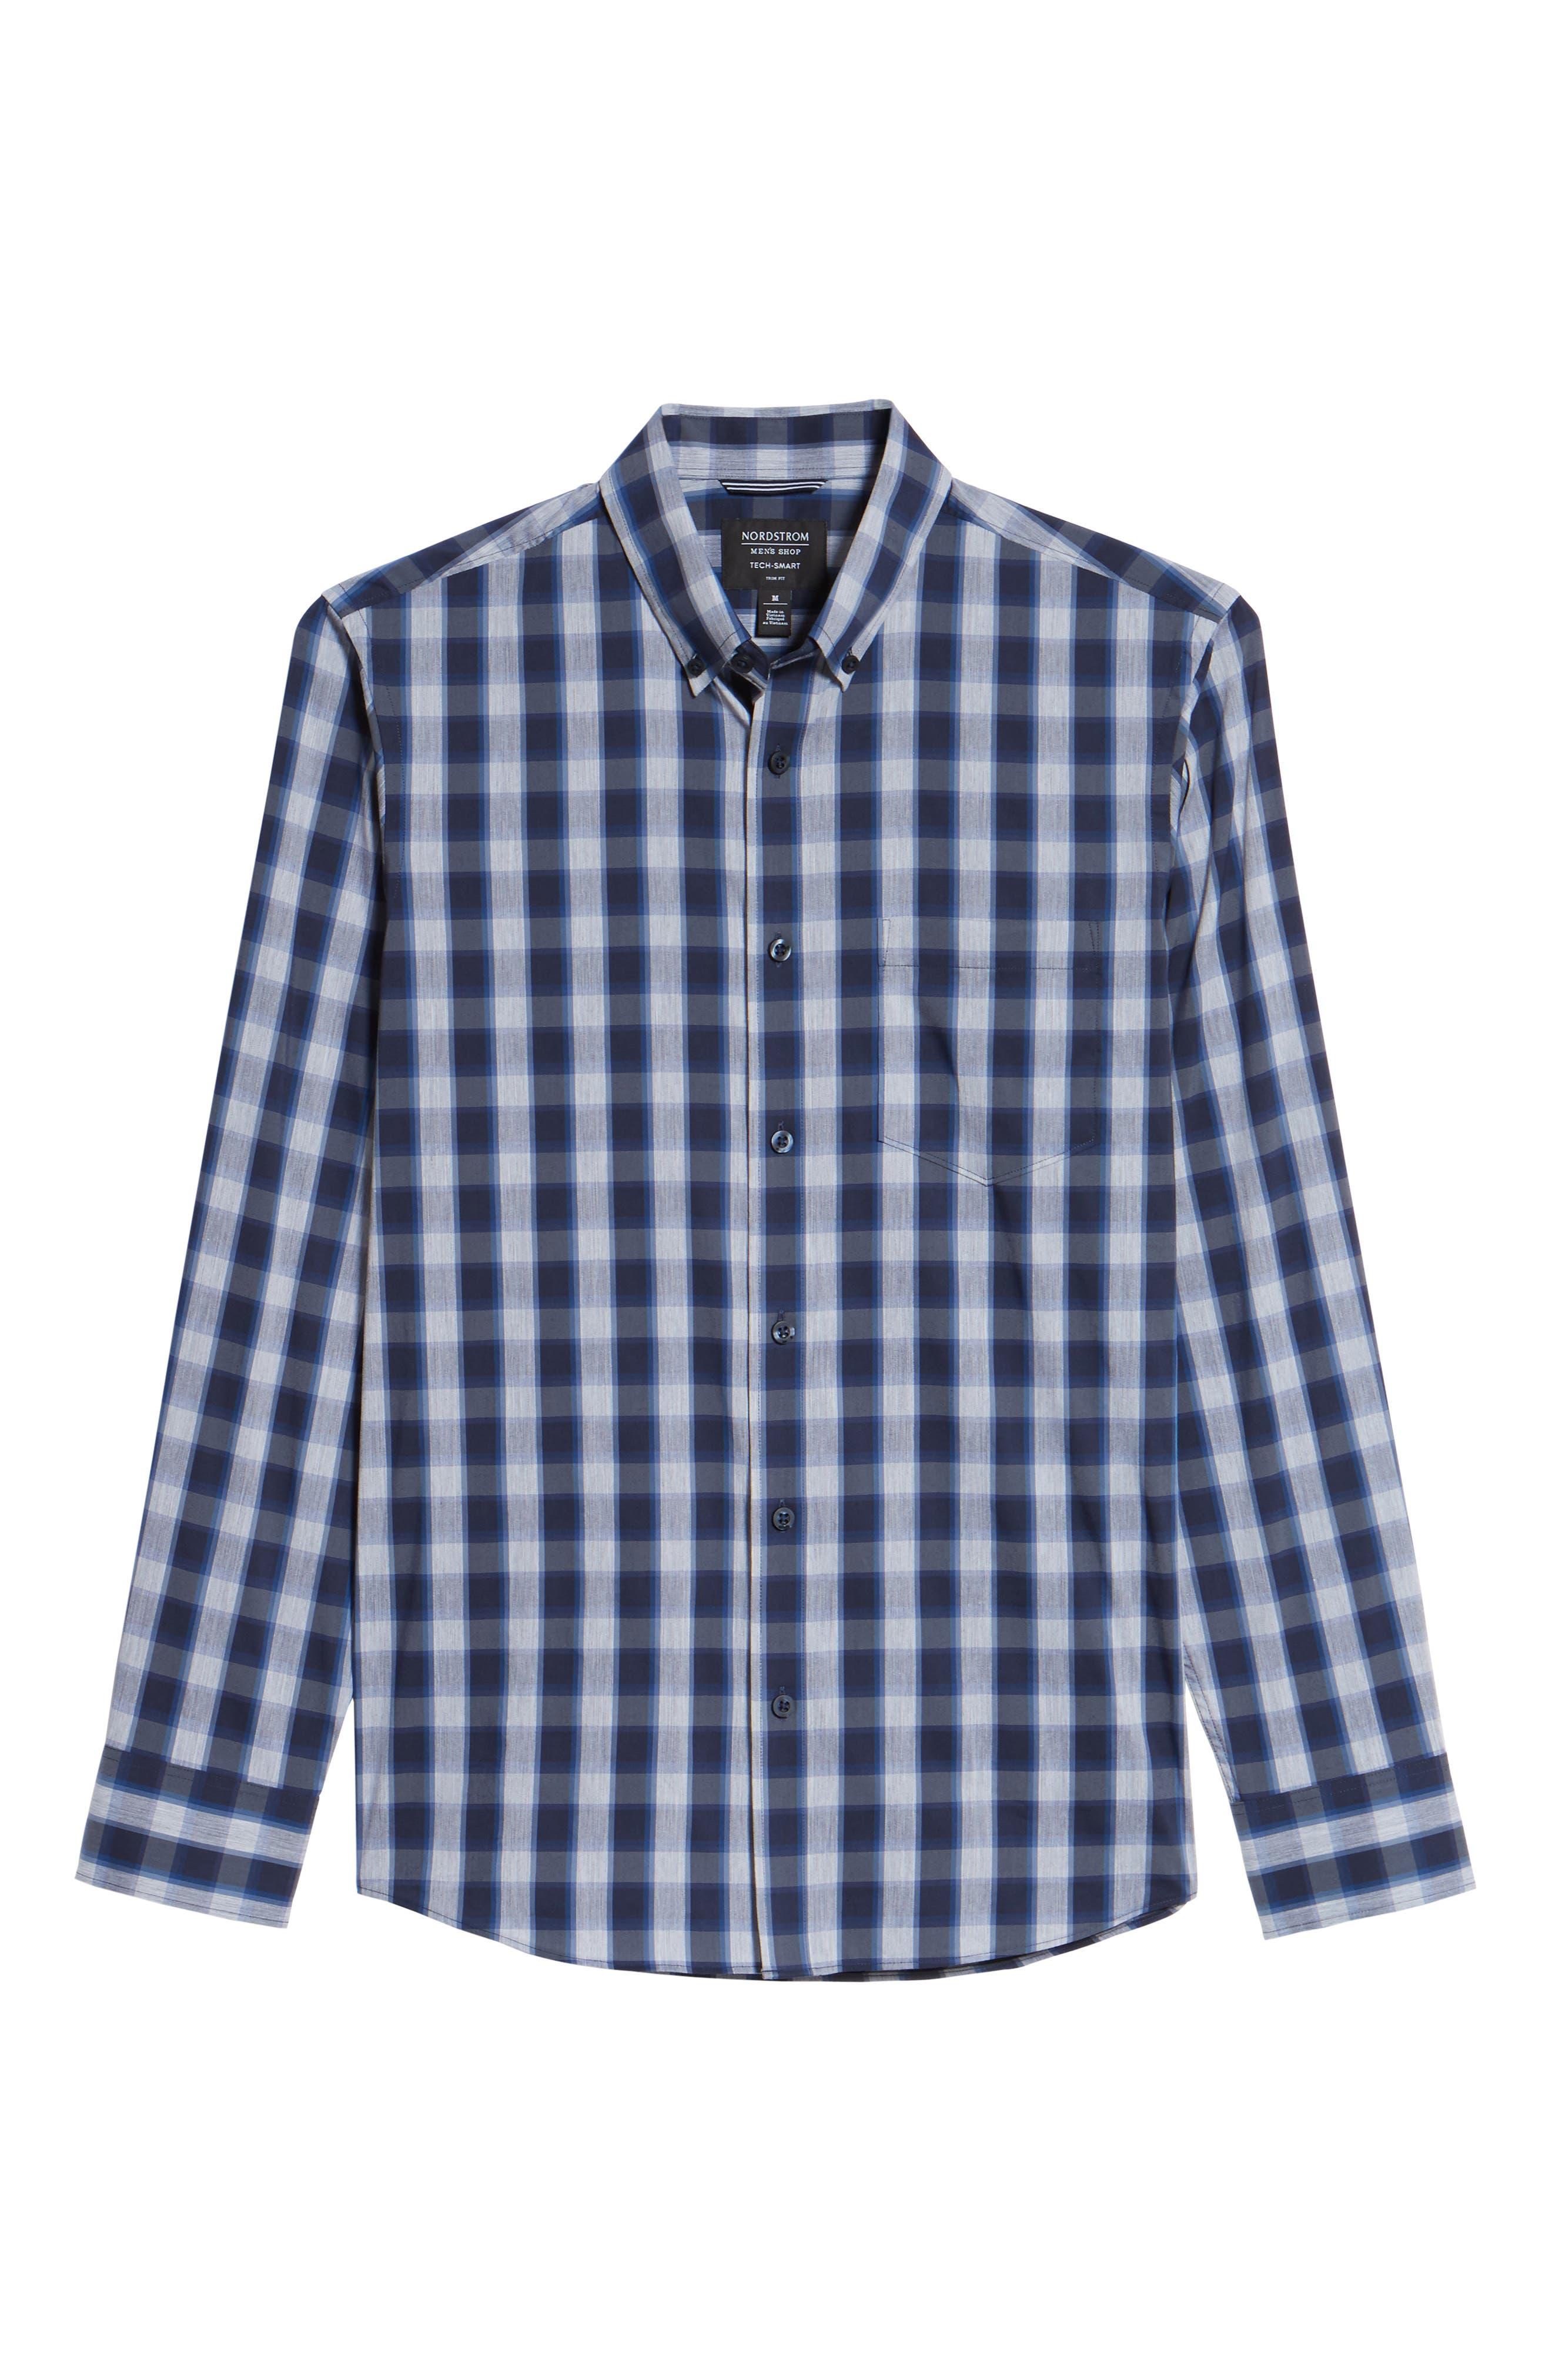 Spade Tech-Smart Trim Fit Check Sport Shirt,                             Alternate thumbnail 6, color,                             410